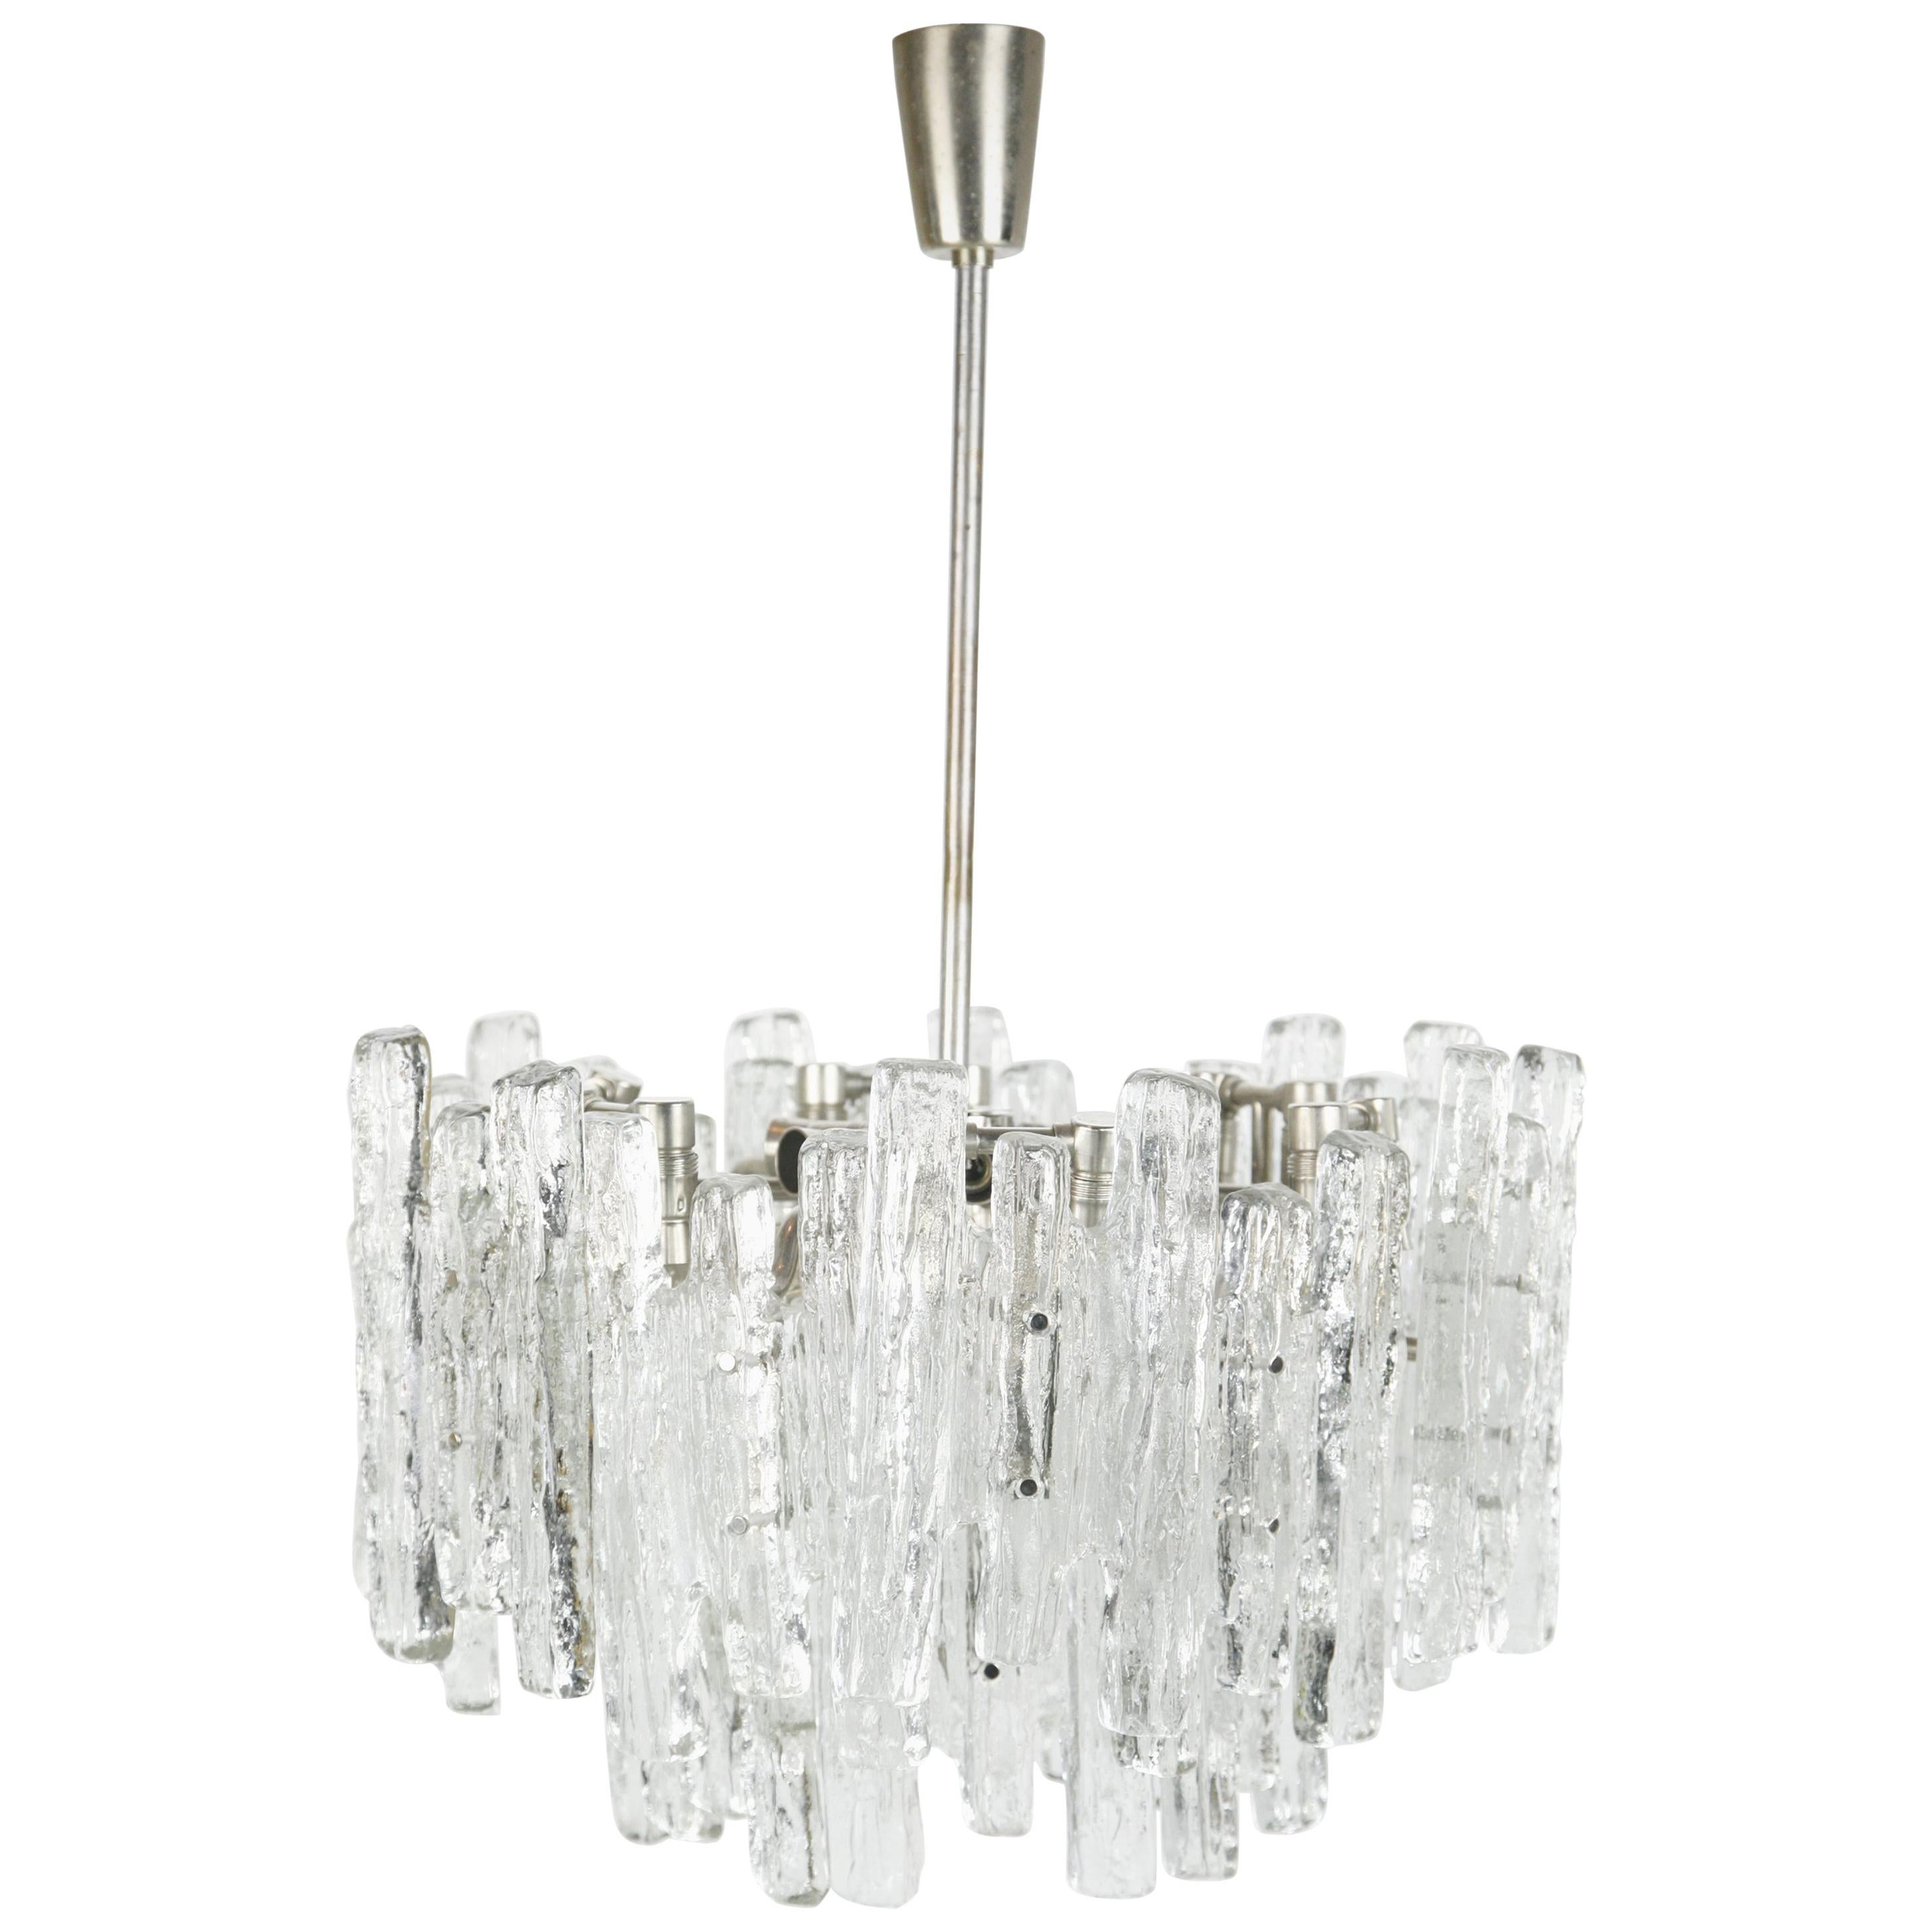 Kalmar Matte Ice Glass Chandelier, Austria, 1960s